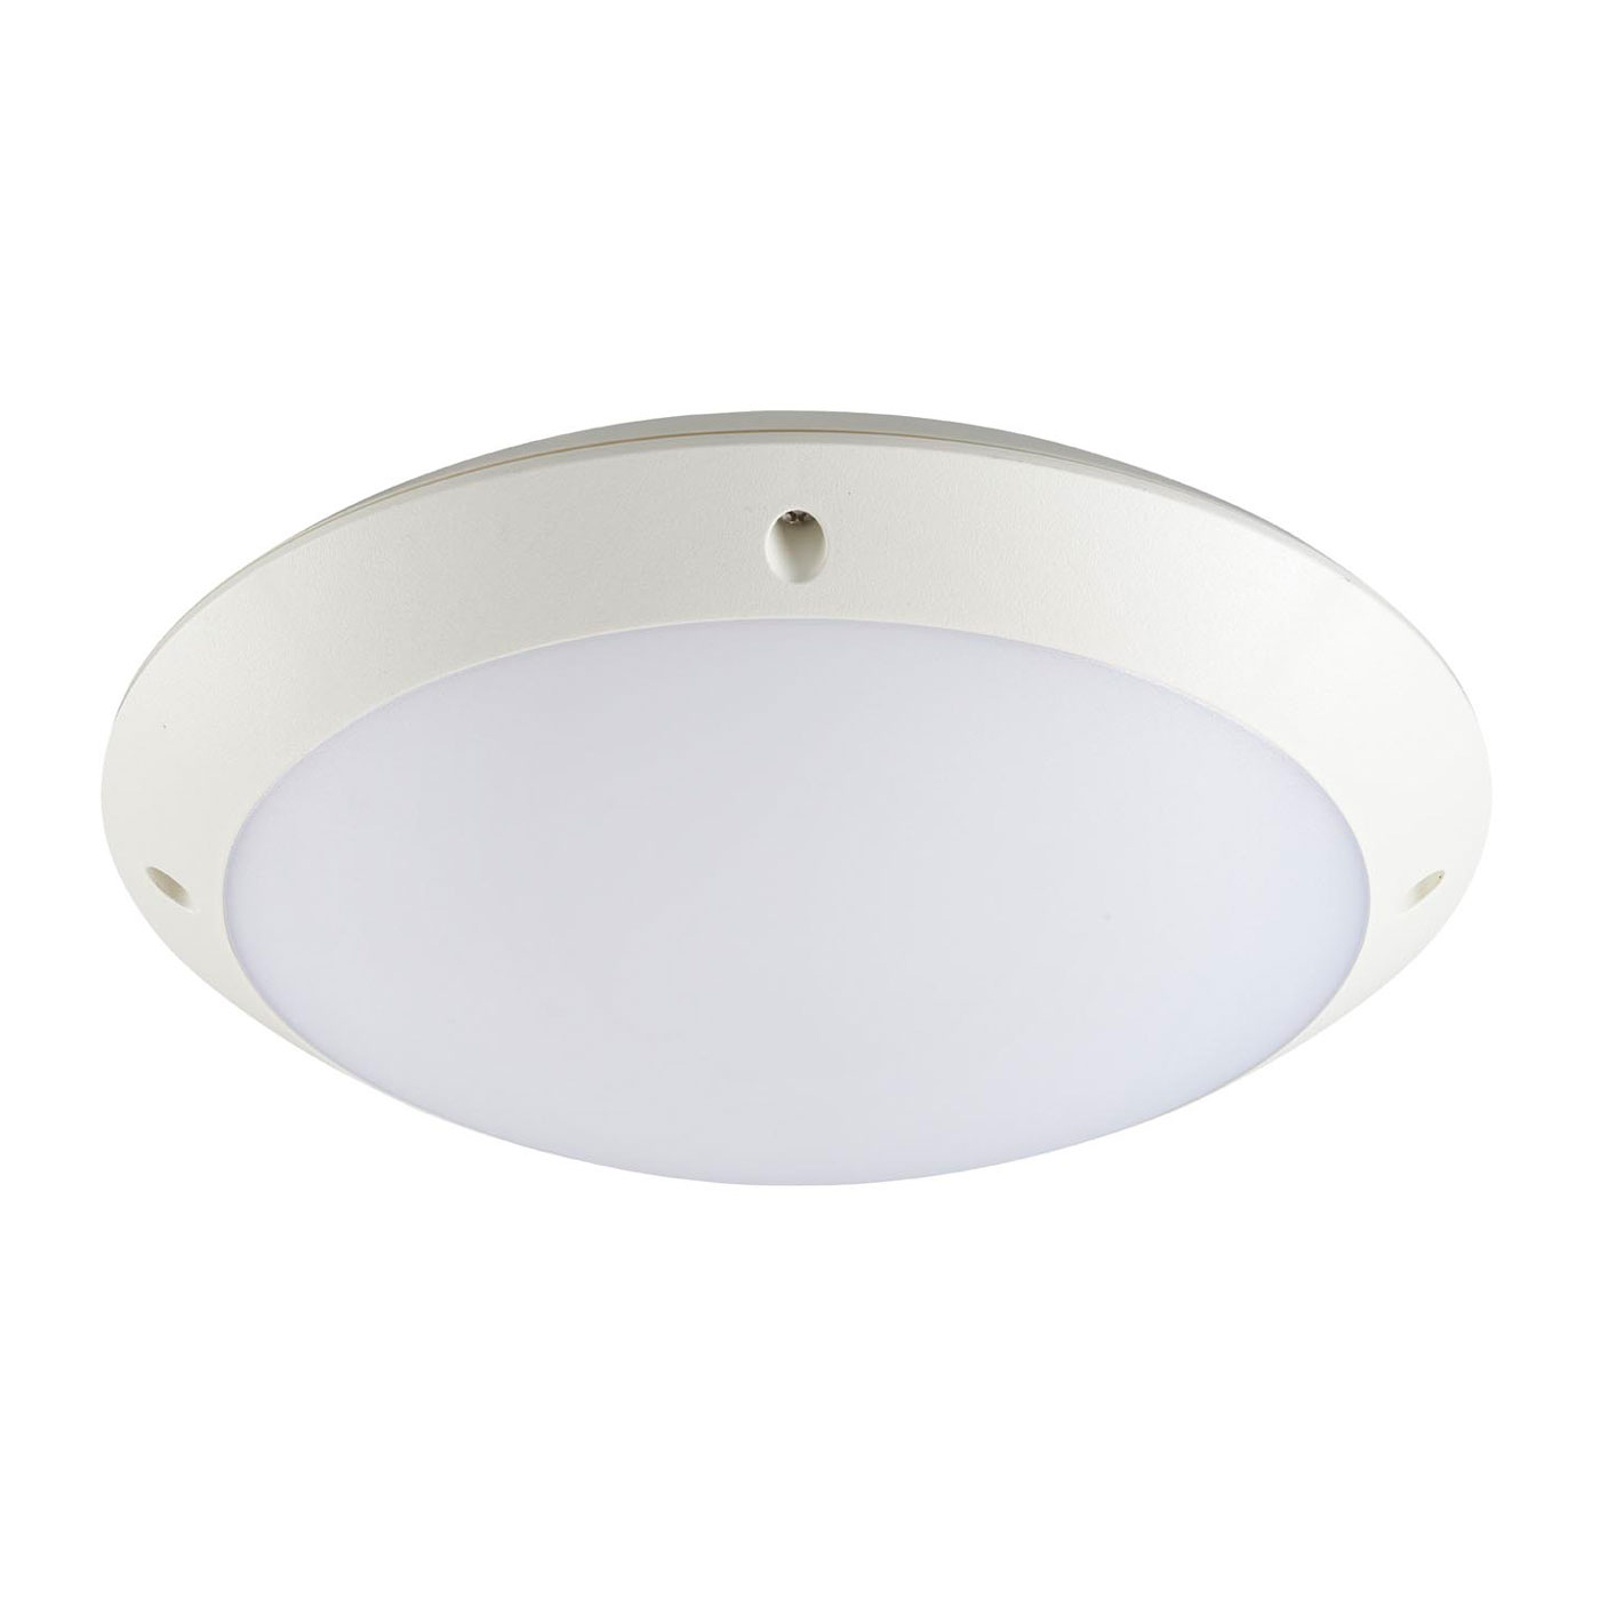 Sylvania Start lampa sufitowa SensorDim biała